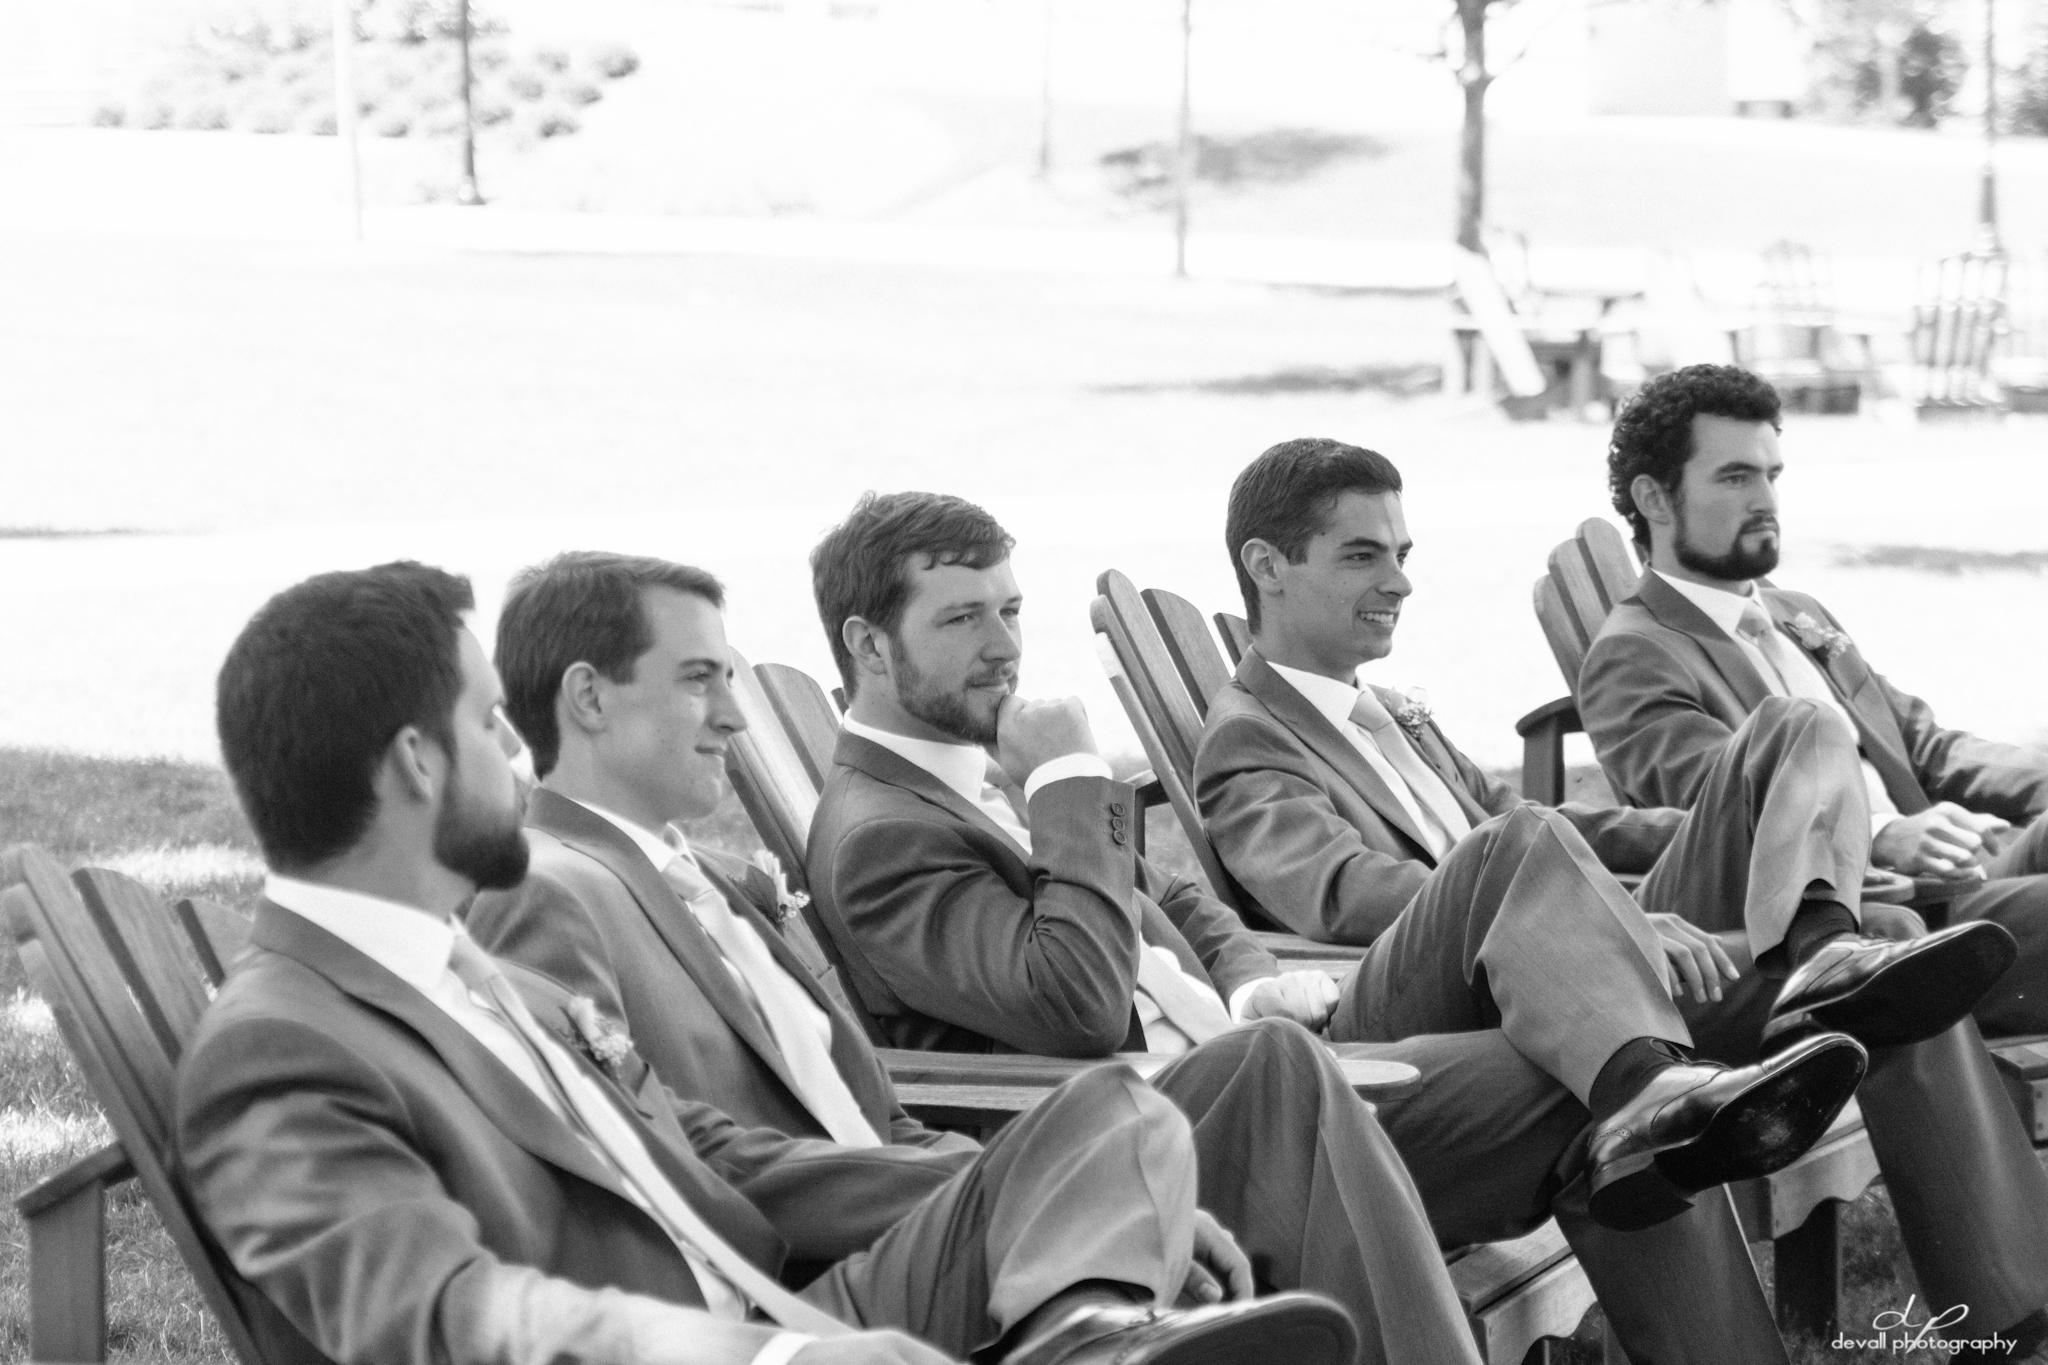 men chairs candid.jpg